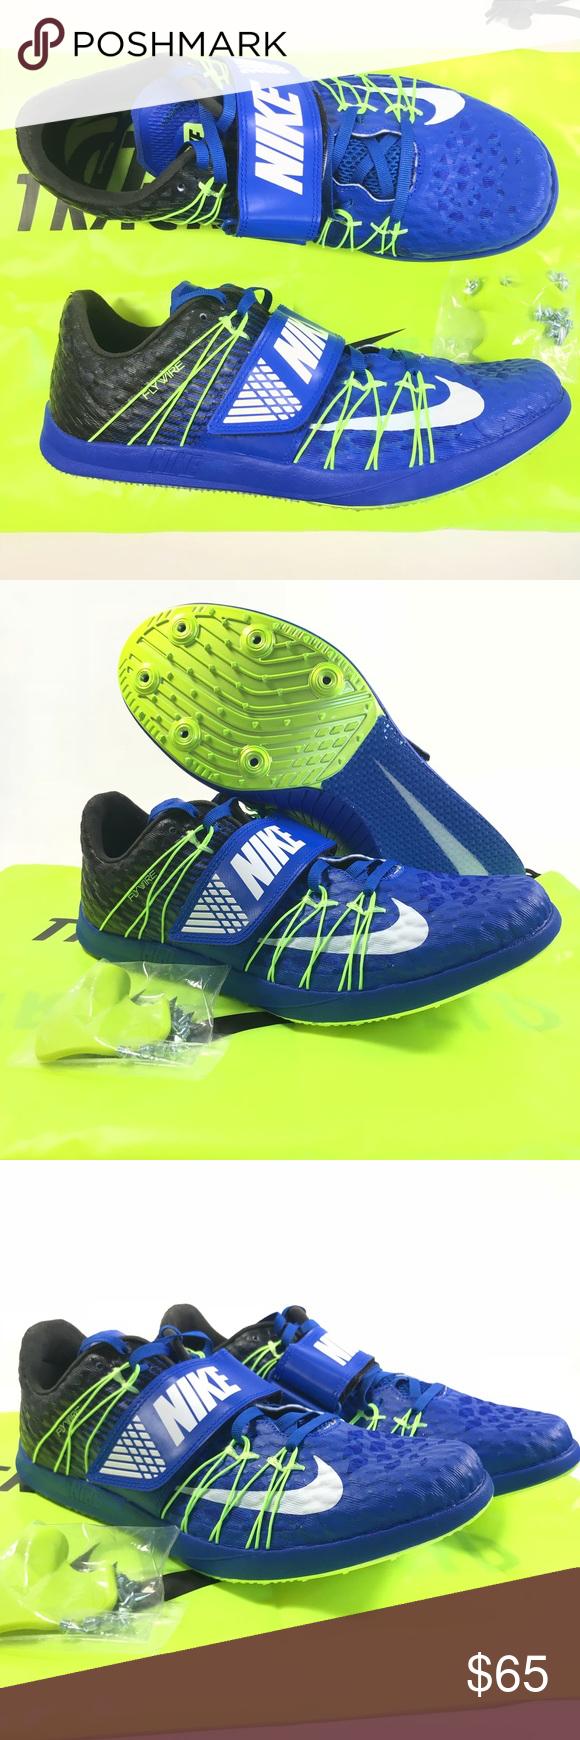 a779a14d0c4f Nike Zoom TJ Triple Jump Elite Track Spikes SZ 10 Item  Nike Zoom TJ Triple  Jump Elite Track Spikes Blue Black Volt SZ 10 ( 705394-413 ) Nike Shoes  Athletic ...